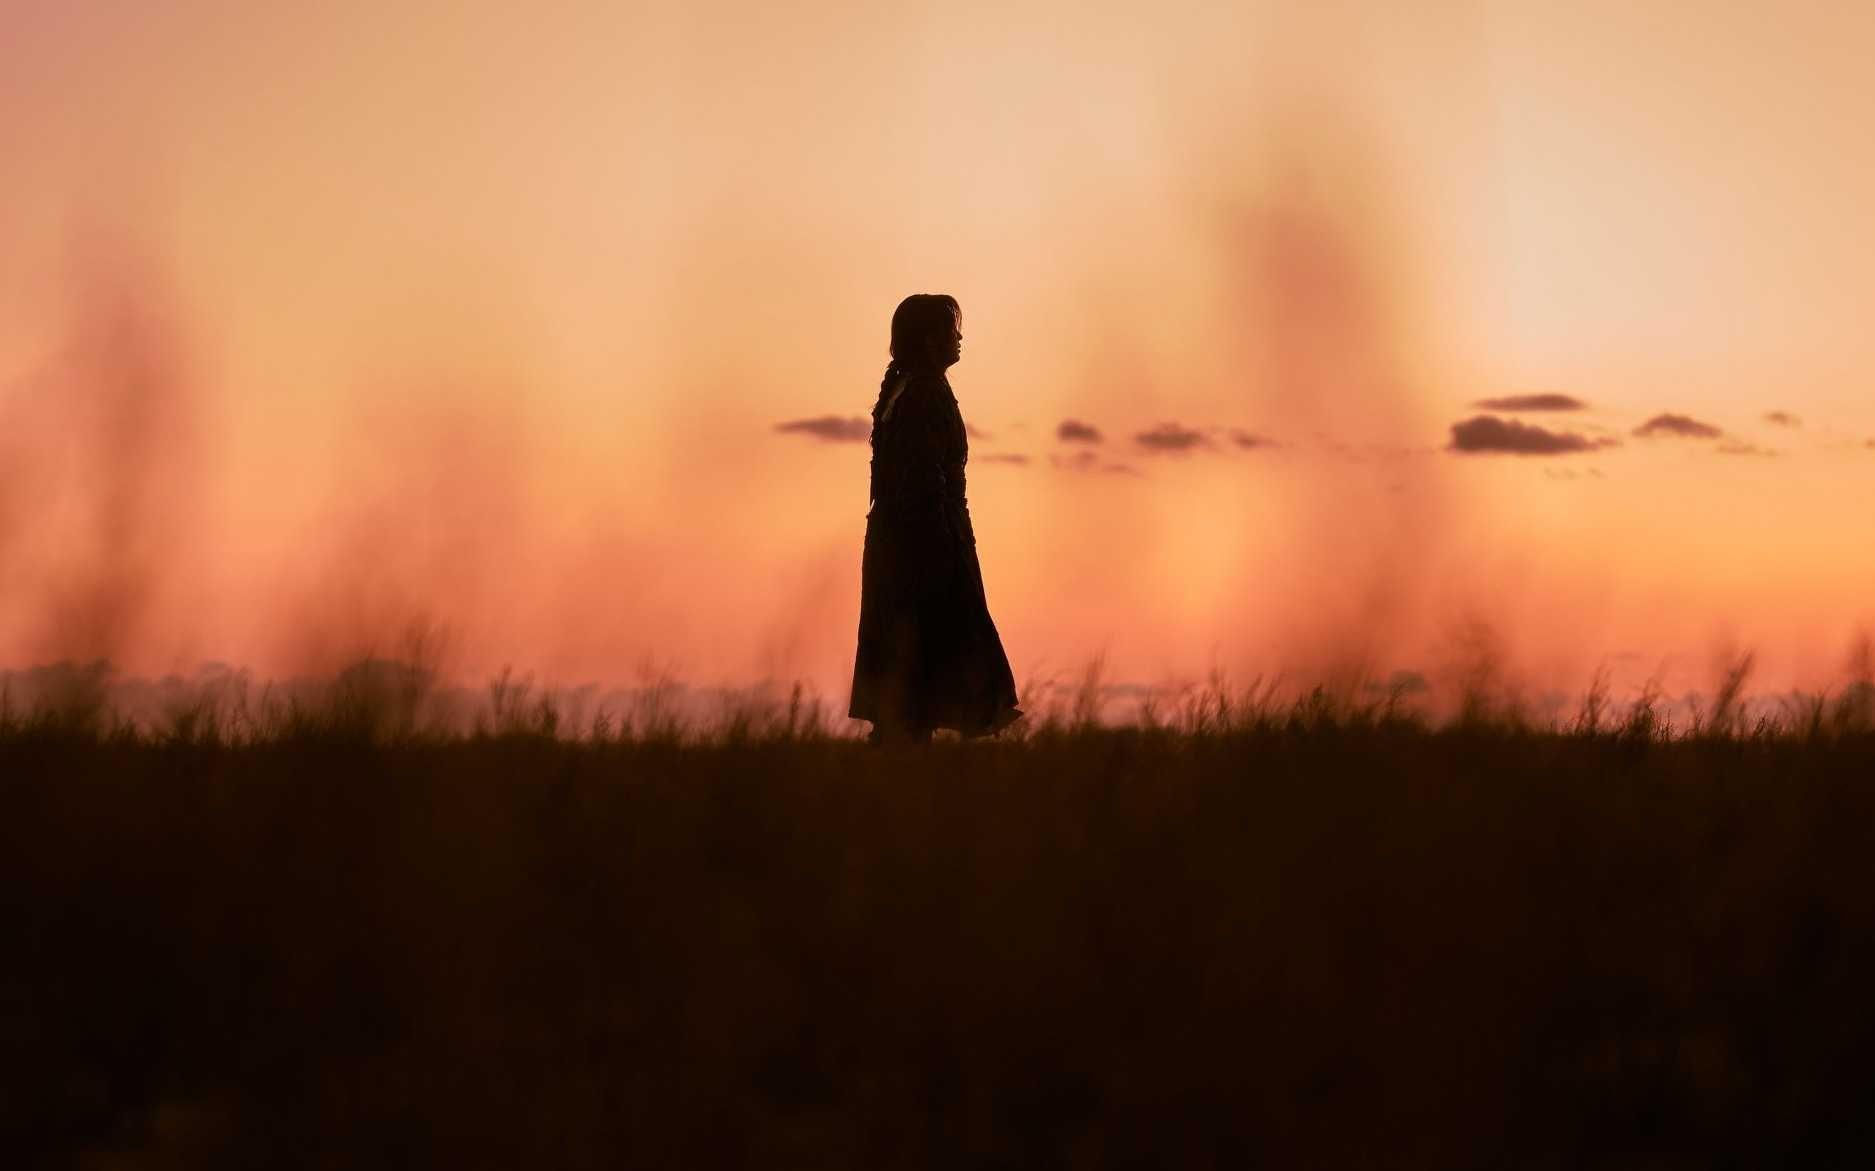 Netflix: 3 Revelations From 'Kingdom: Ashin Of The North'